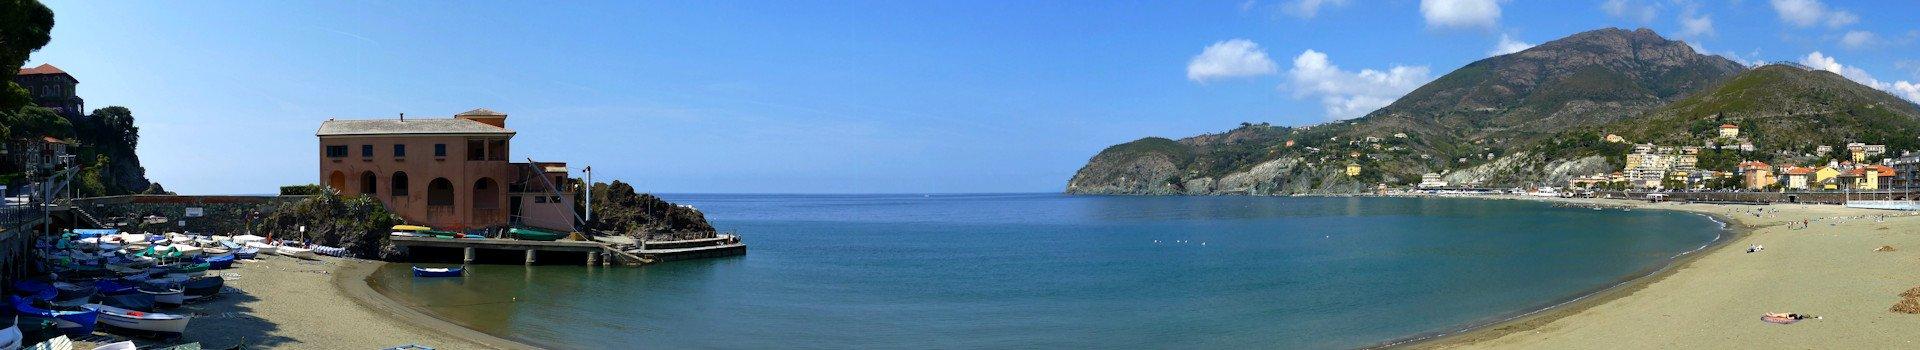 Sentiero Verdeazzurro: Levanto – Monterosso